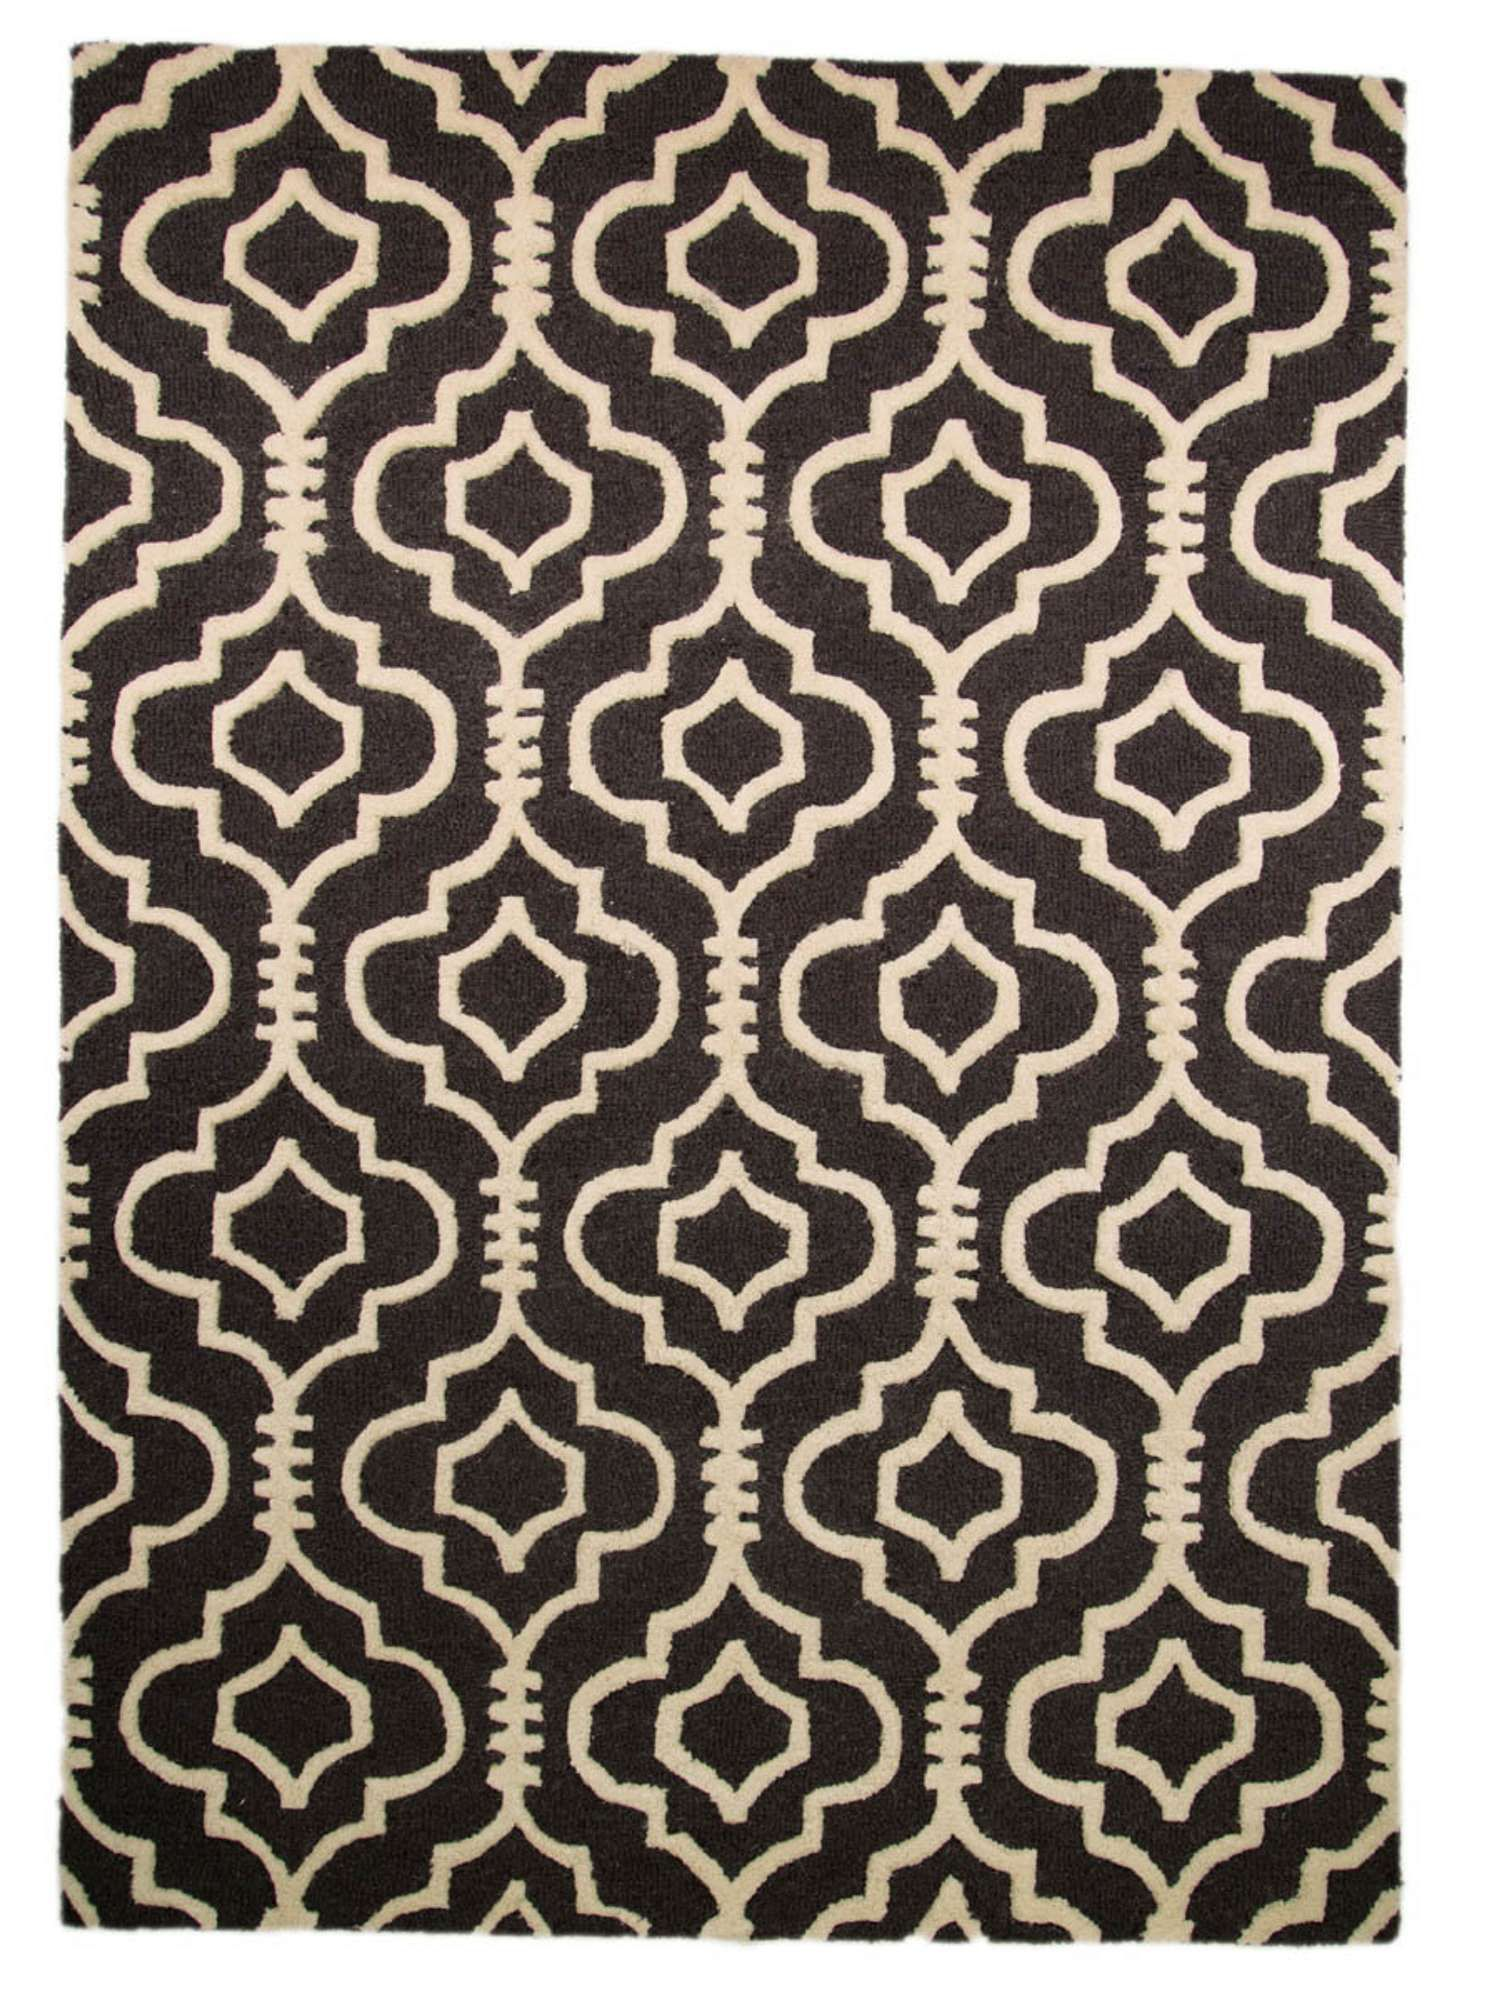 Rugs Morroco Charcoal Pattern Rug